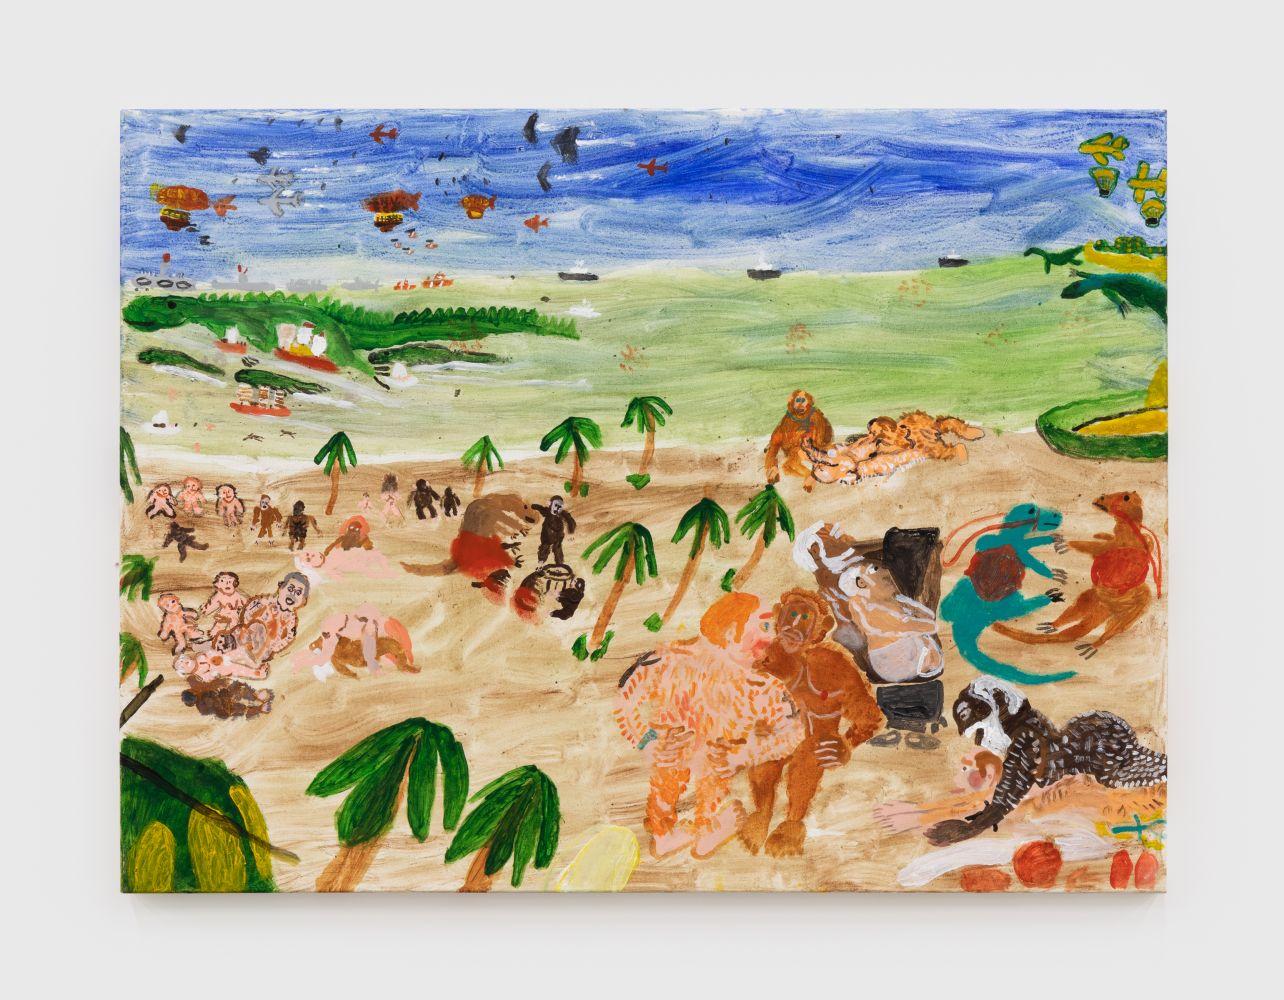 Raynes Birkbeck, Bill Halsey's Stigmata, 2020. Oil and acrylic on canvas, 36 x 48 in, 91.4 x 121.9 cm (RBI20.006)